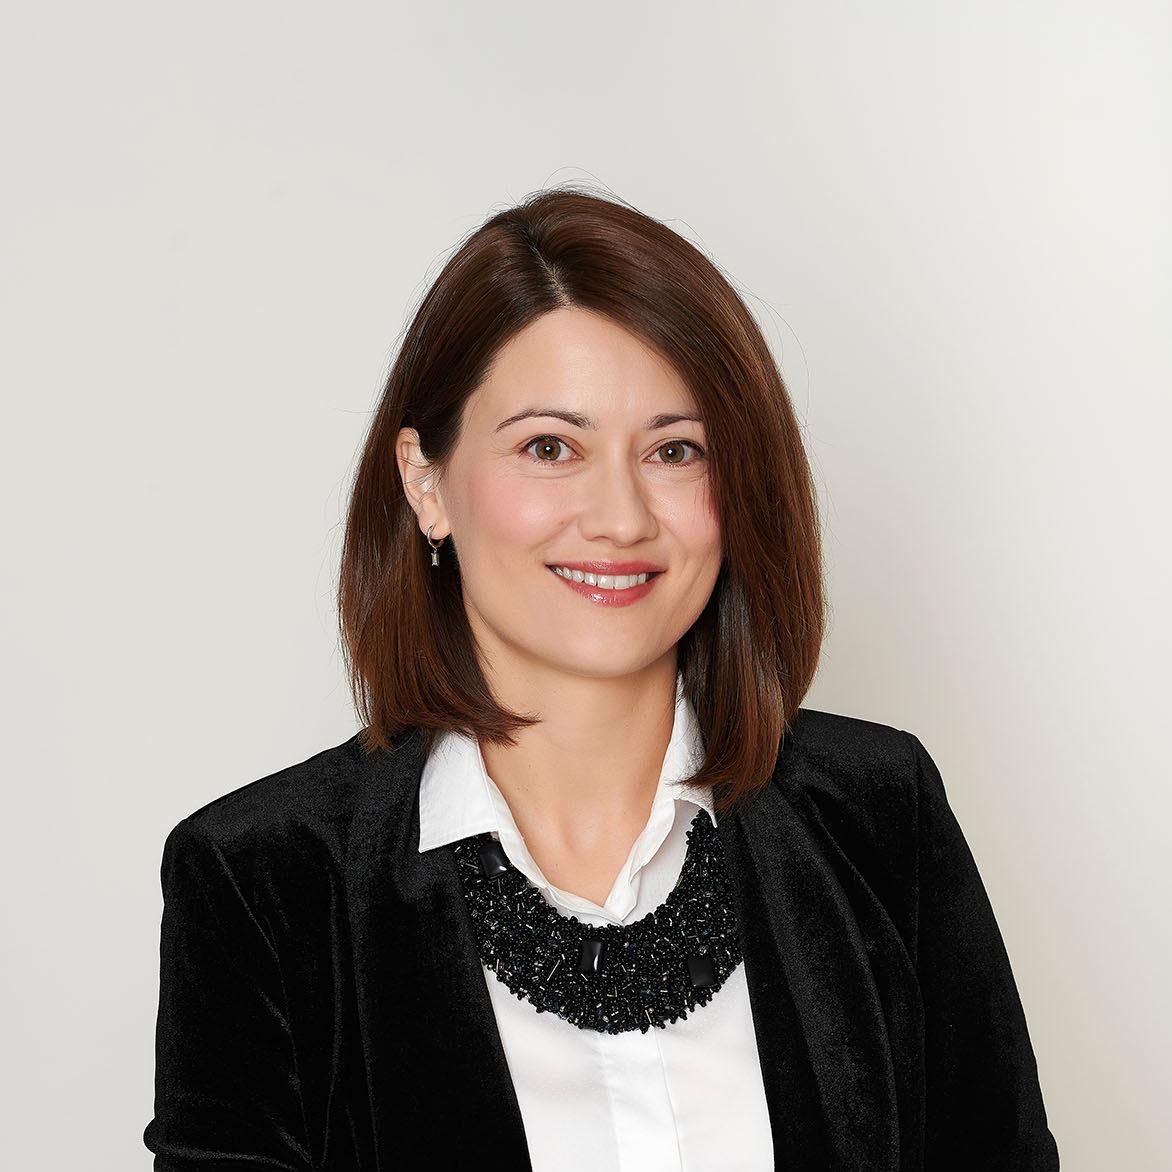 Karolina Wojcieszuk